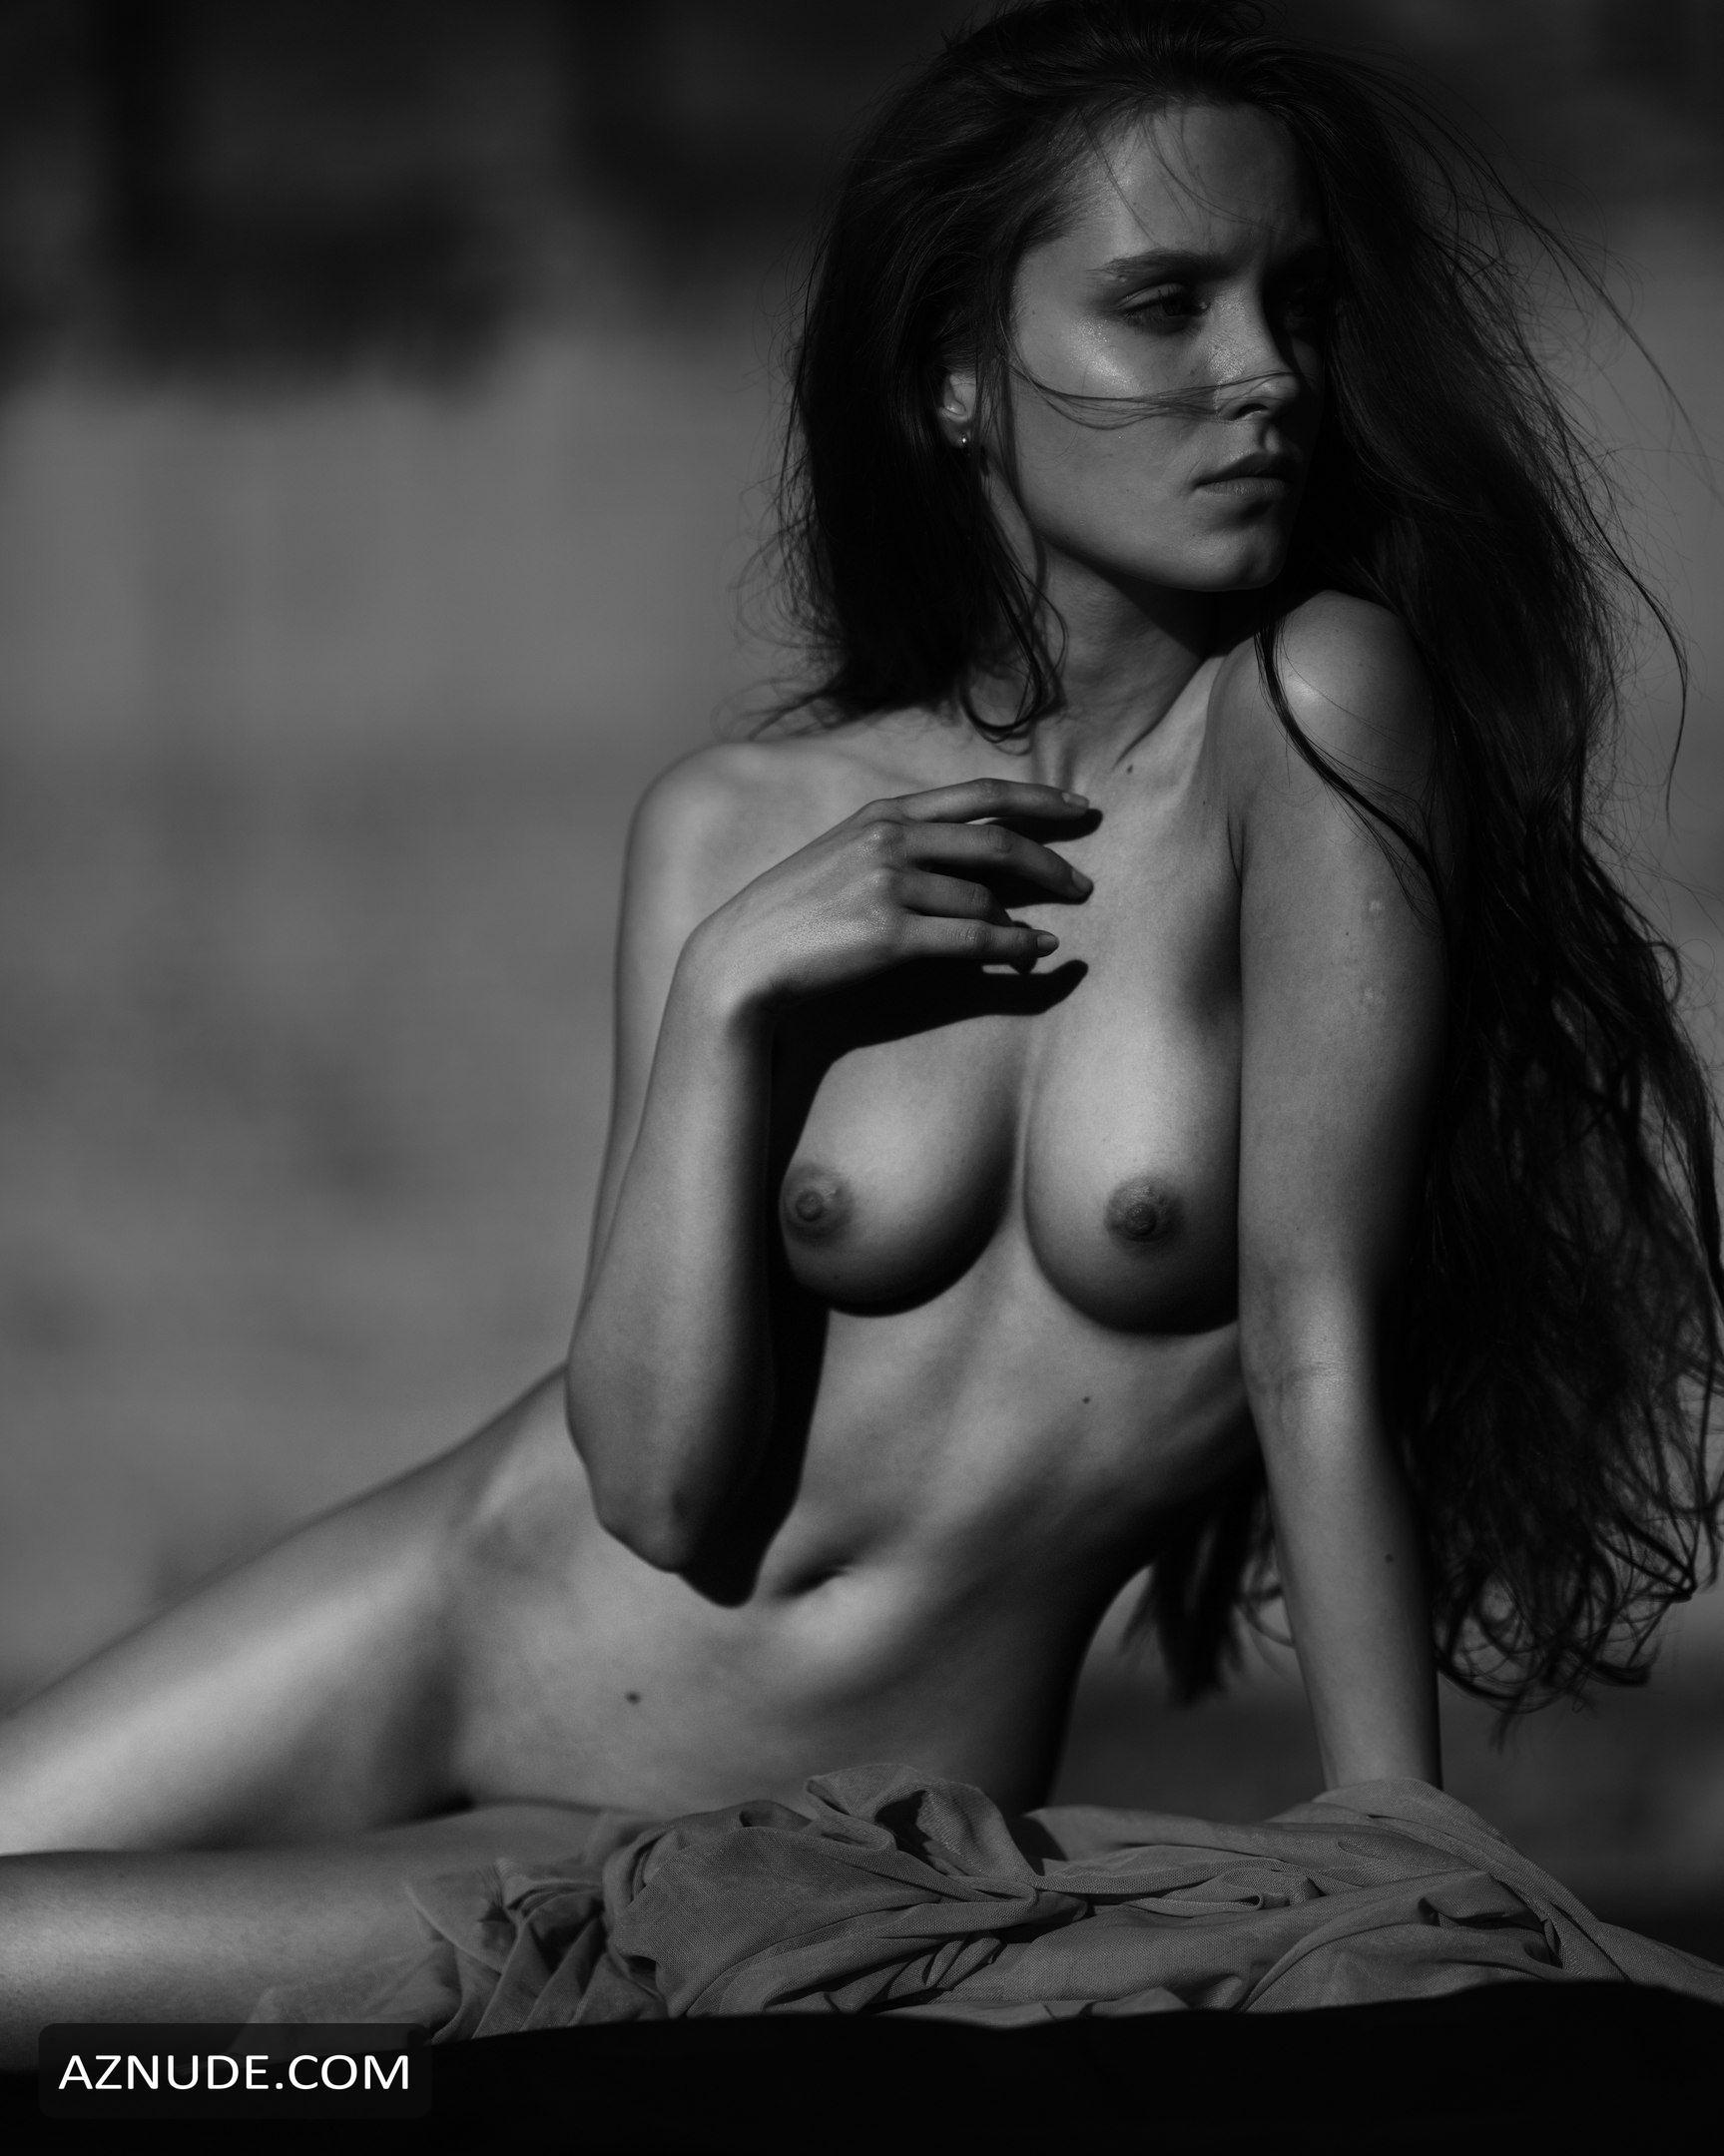 Fenix Raya Nude Photos and Videos